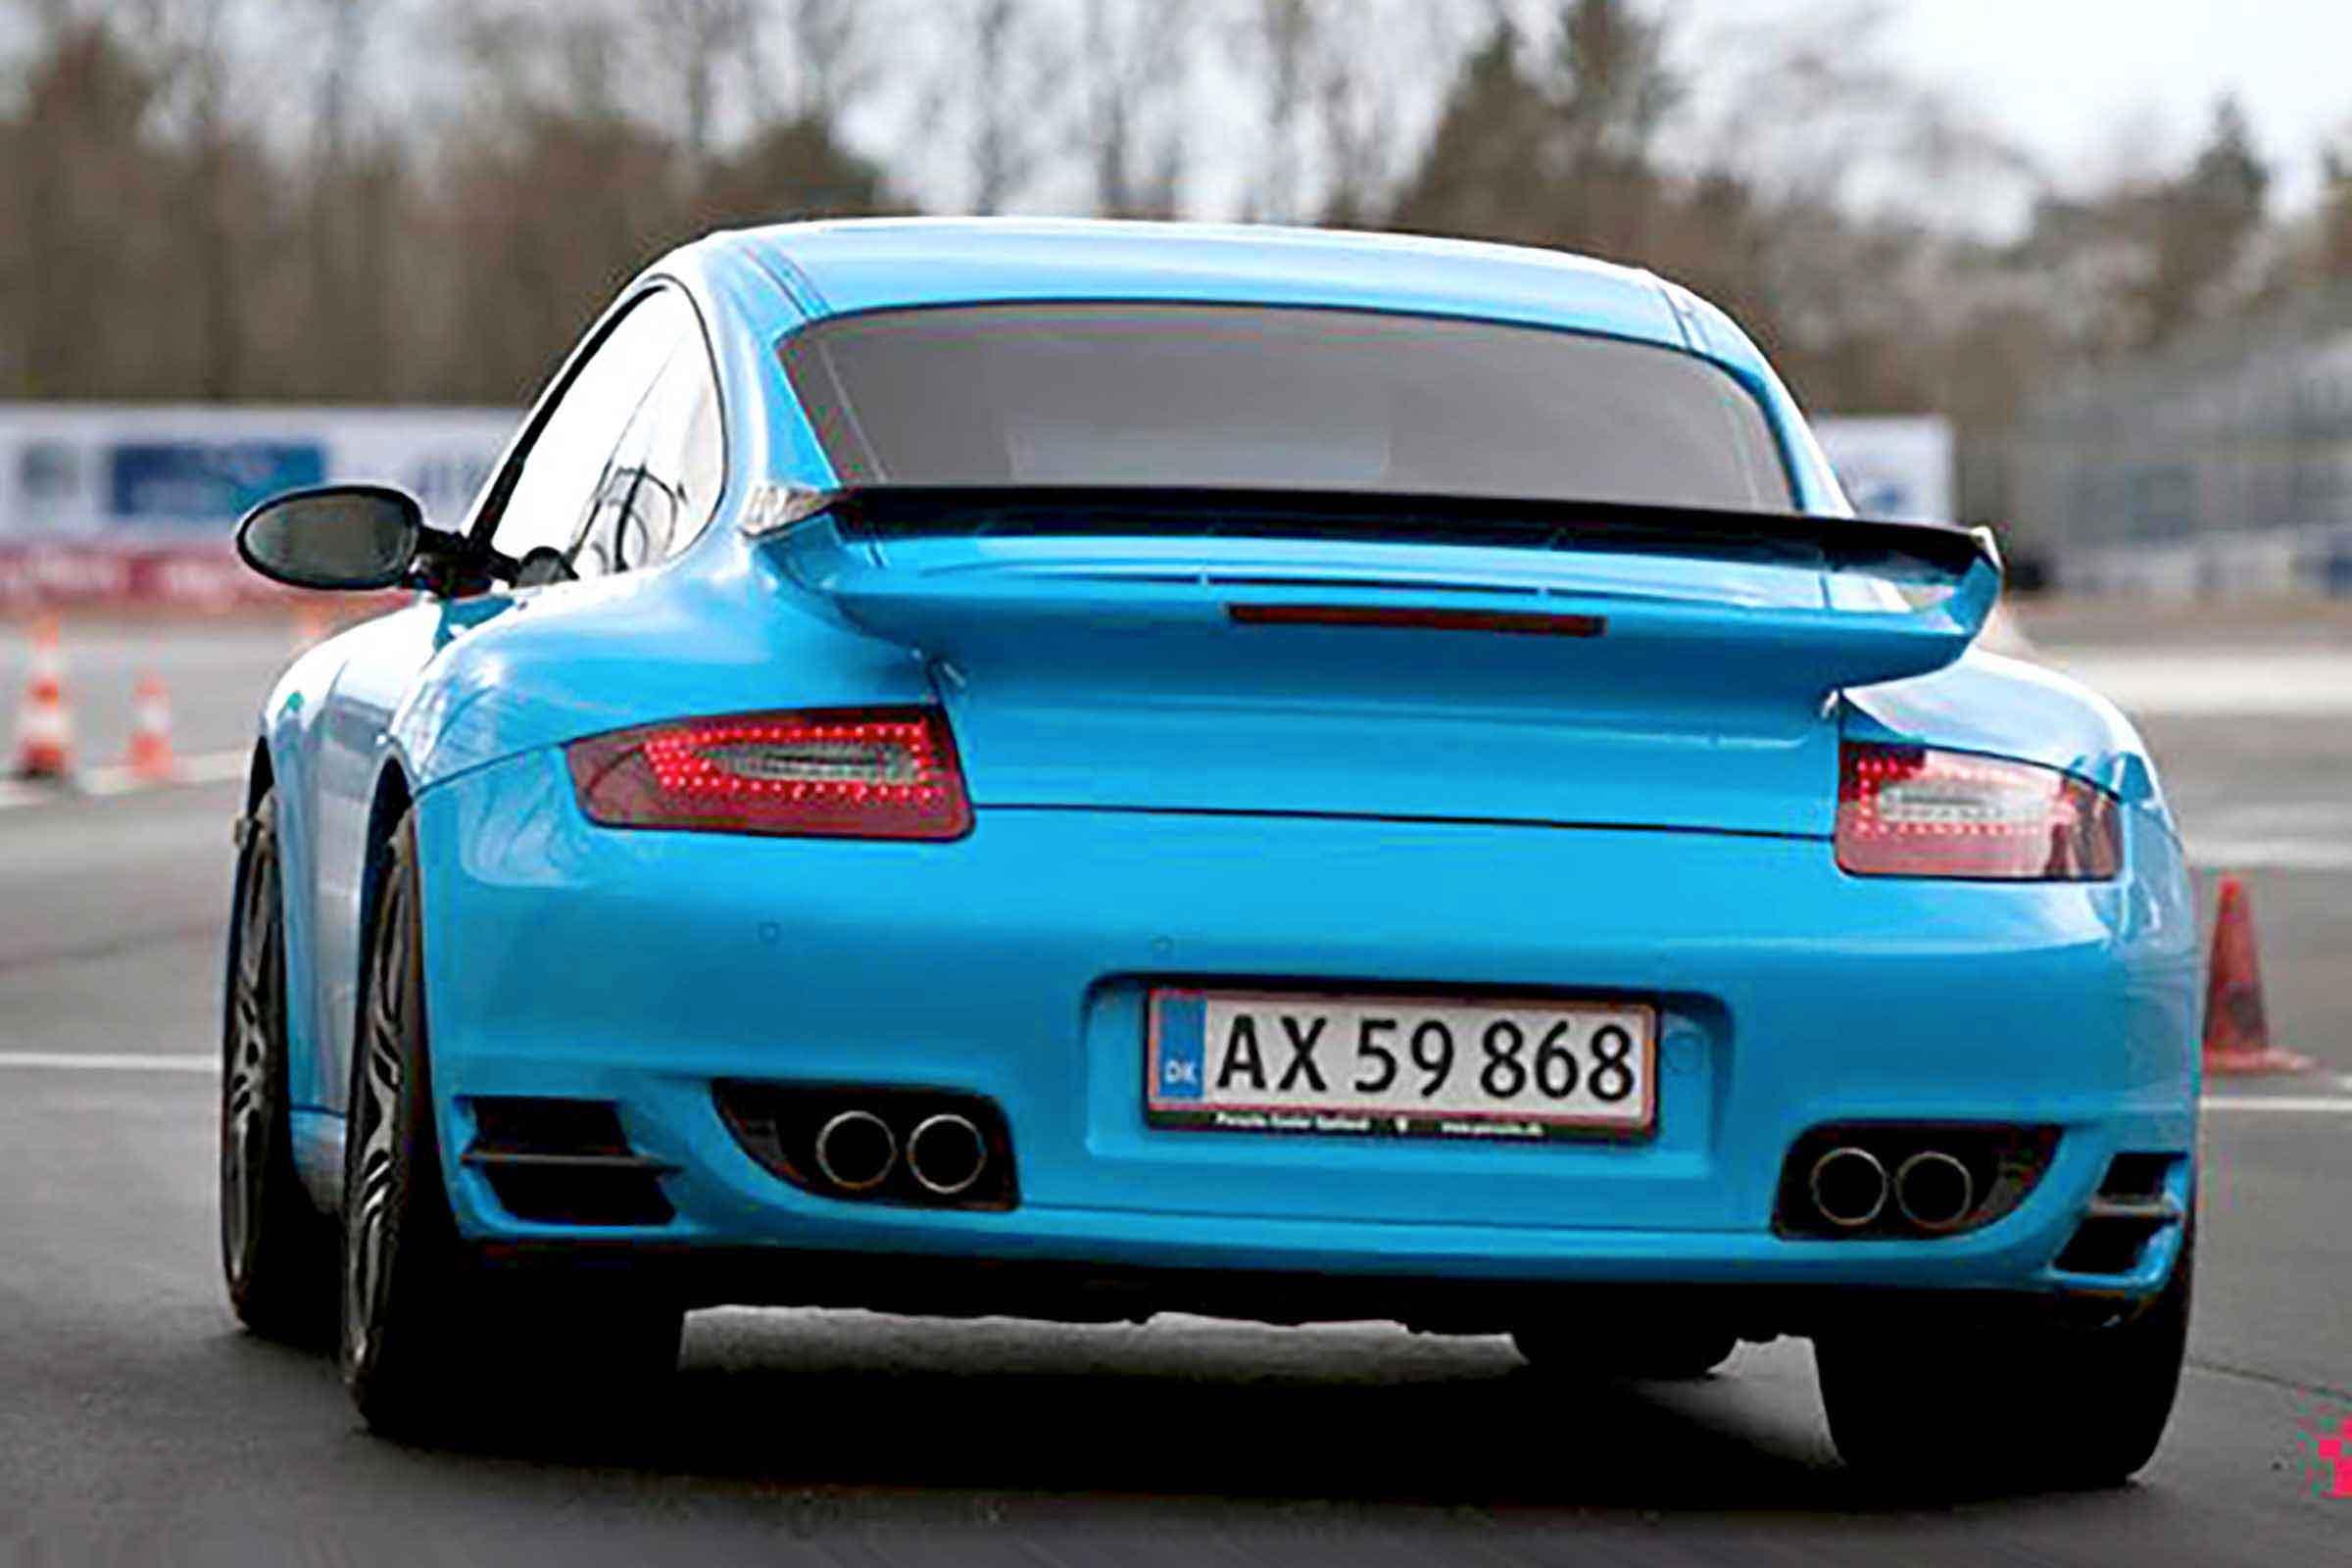 Kör Porsche 911 Turbo på Racingbana